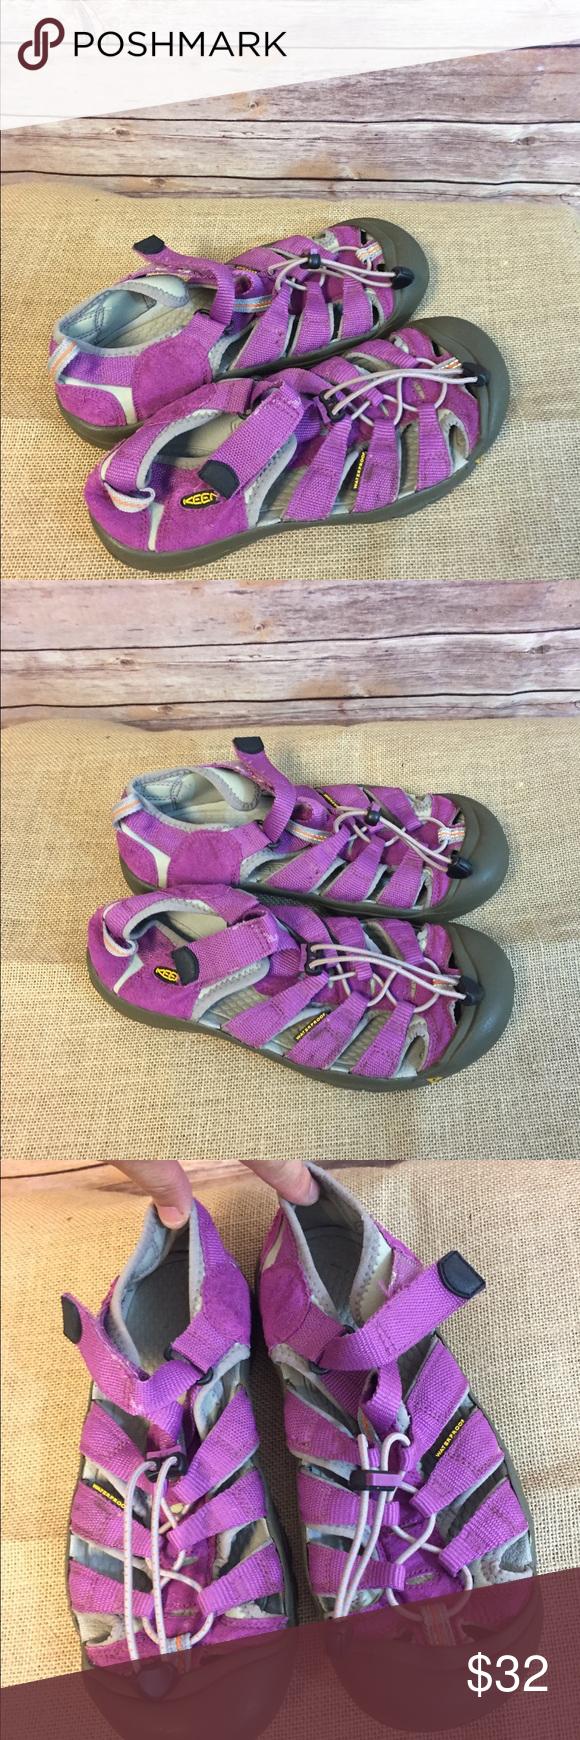 Keen Sz 6 Purple color, Nice shoes, Keen shoes